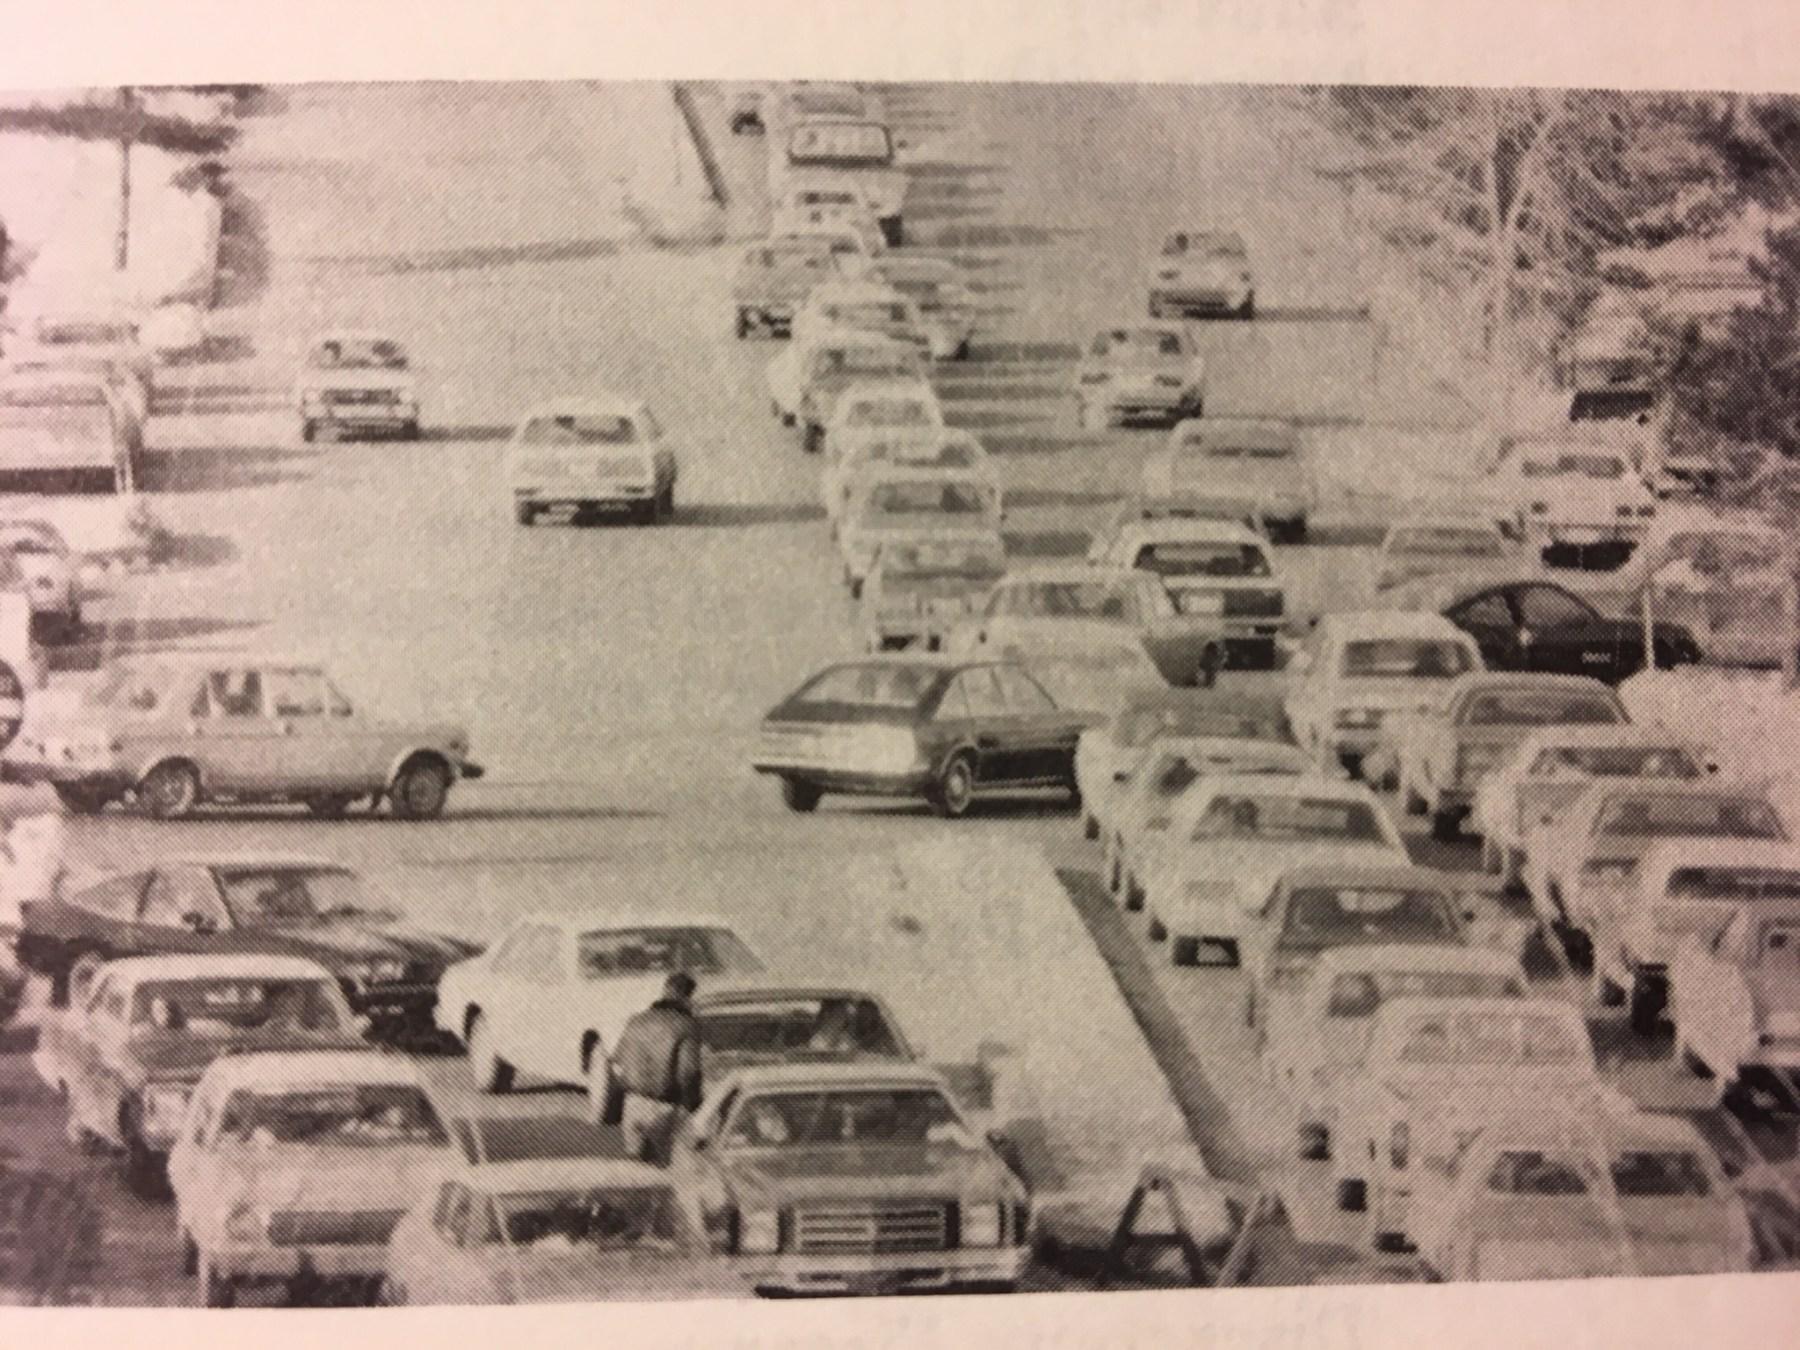 Burlington mall Tpke exit, early 70s